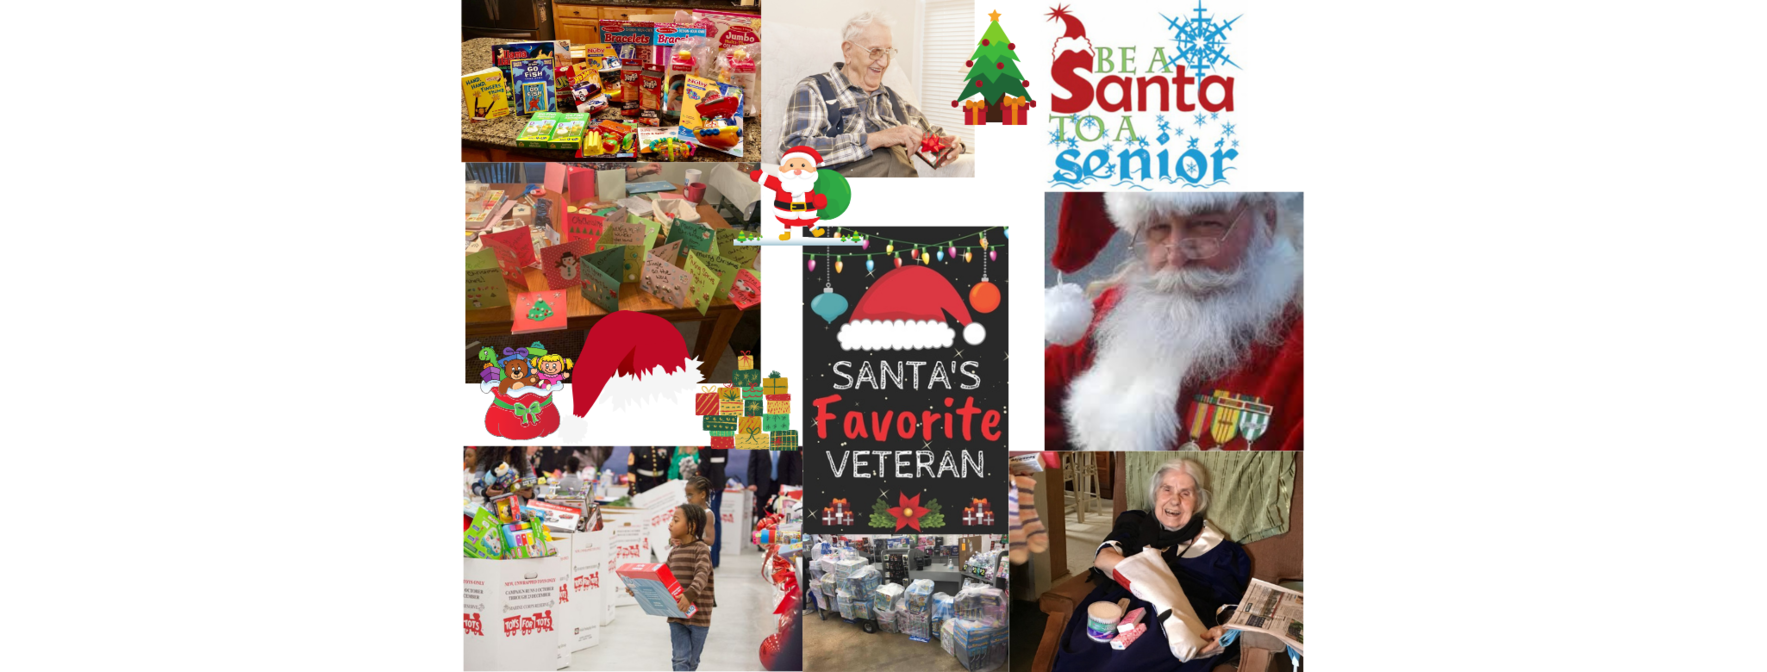 Please Help Us Spread Some Joy to Seniors, Veterans, & Children in Need image